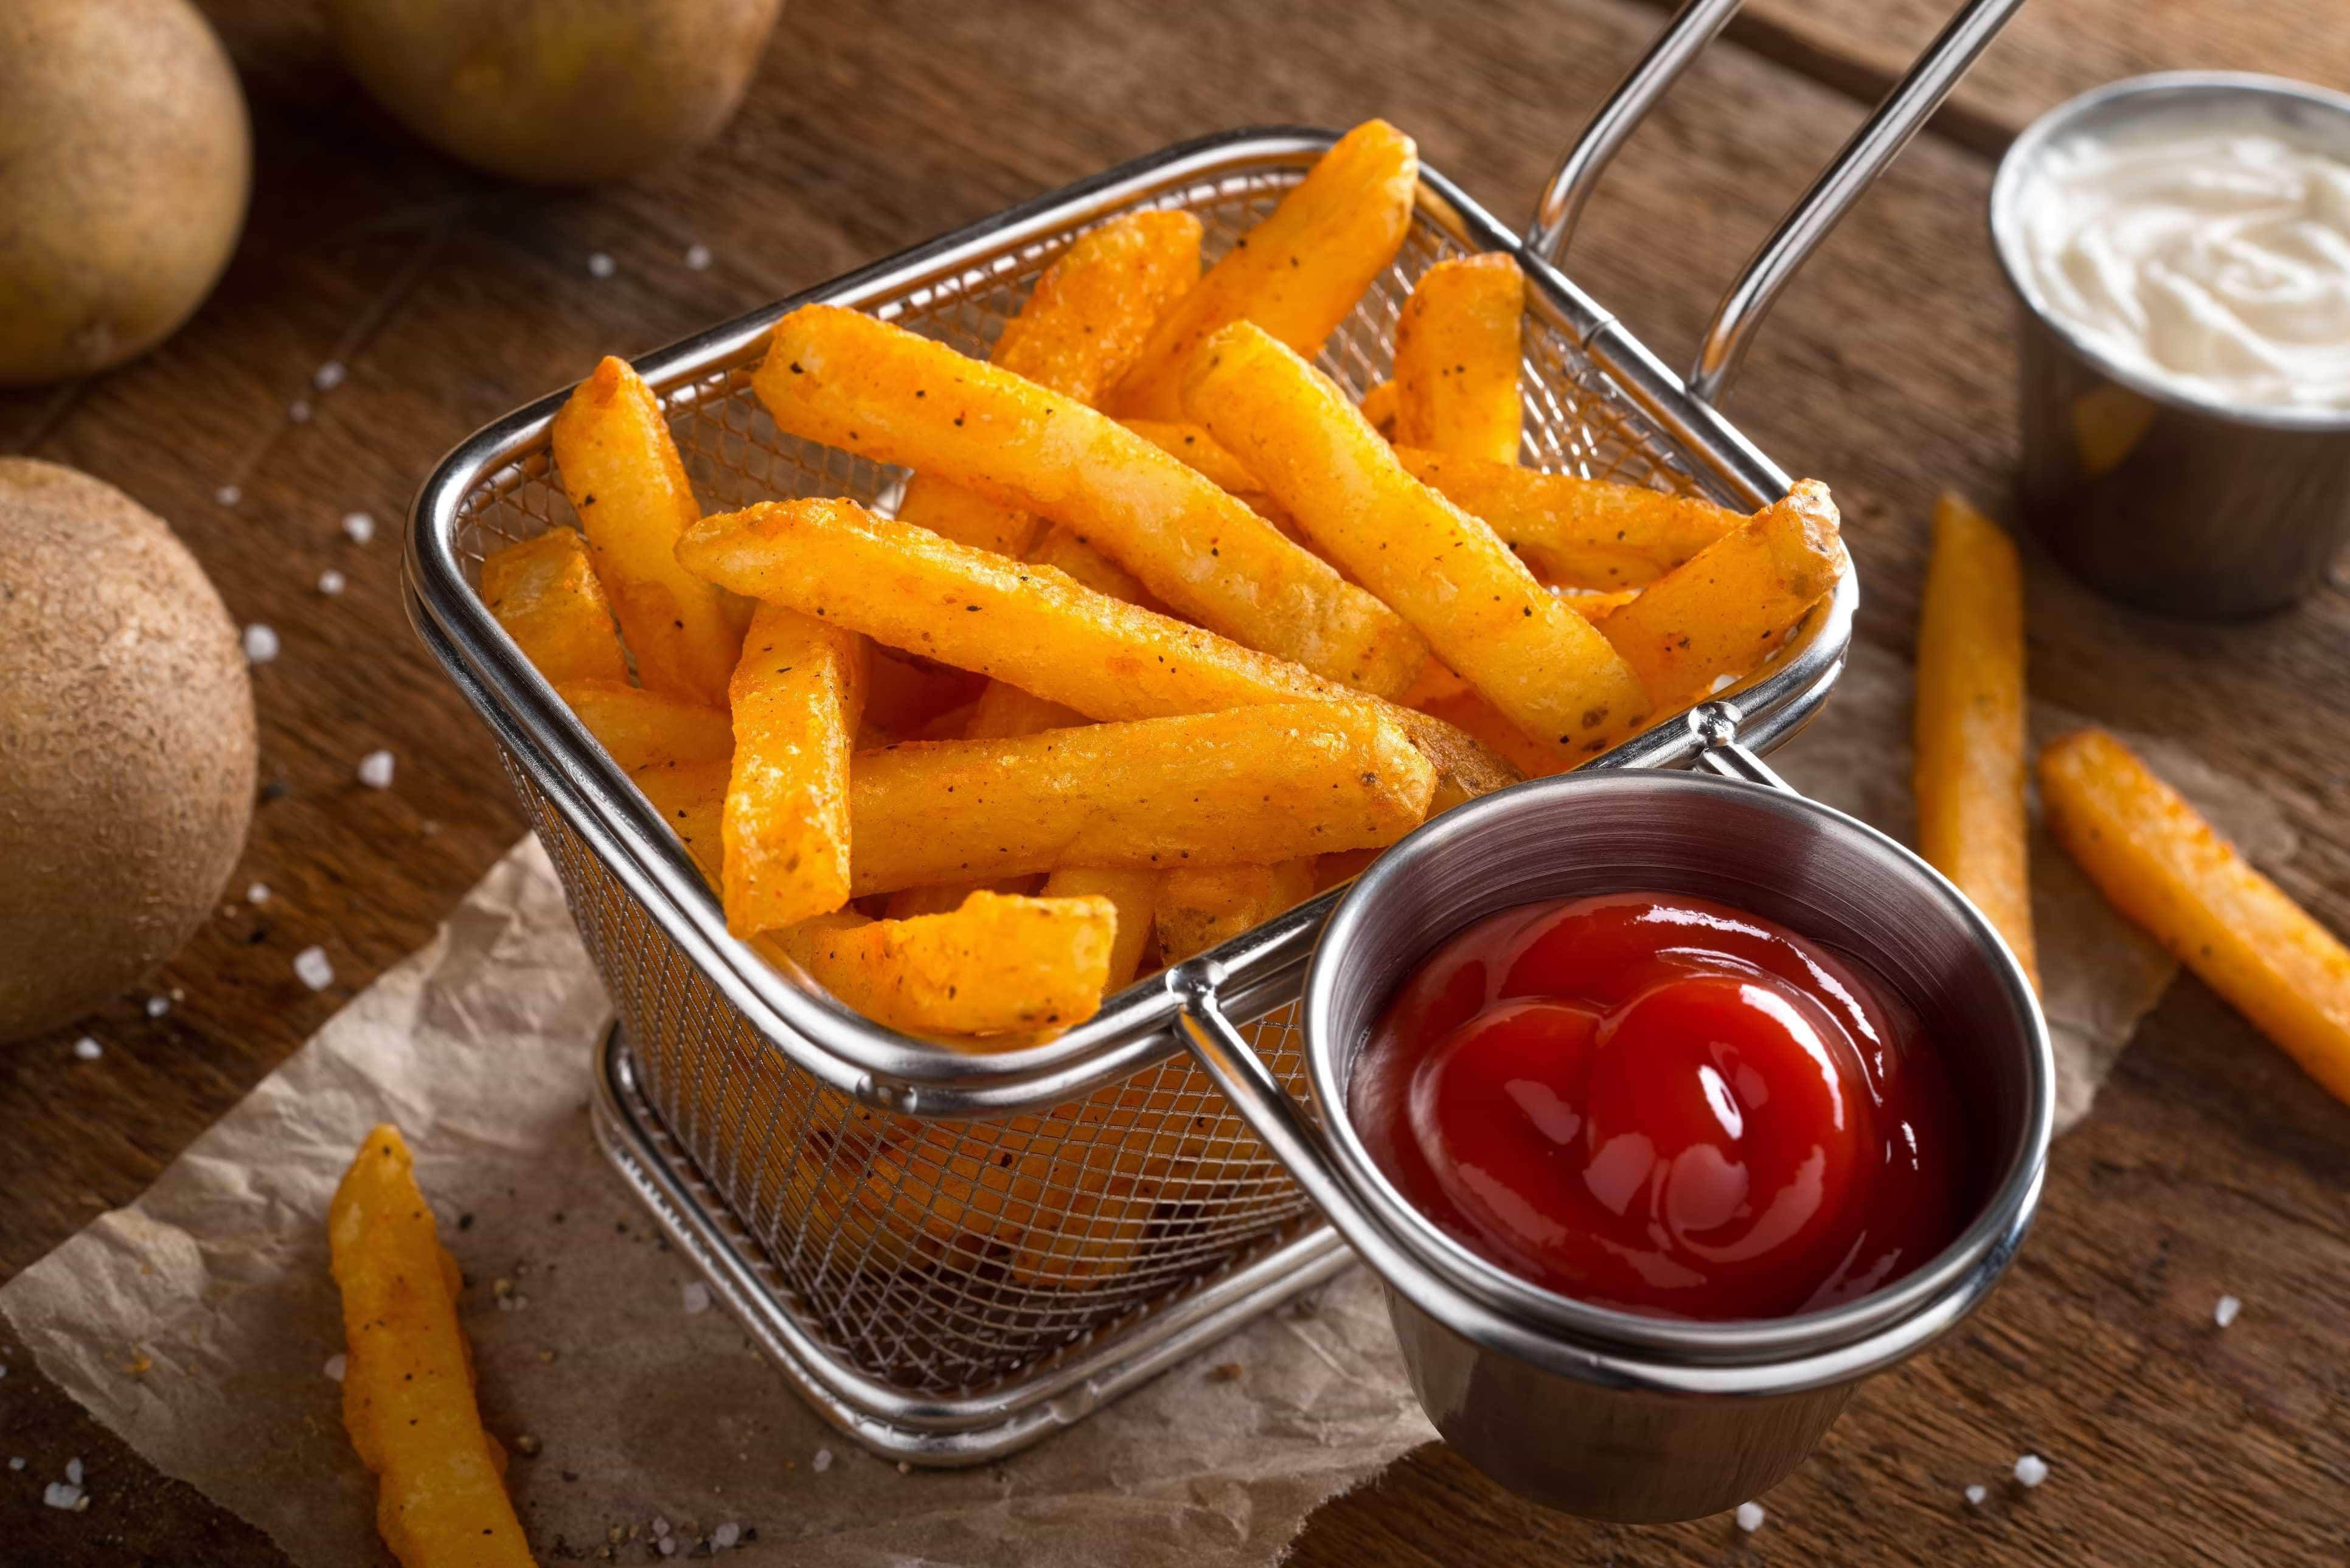 Está a deitar ketchup nos alimentos de forma errada. Pista está no nº57